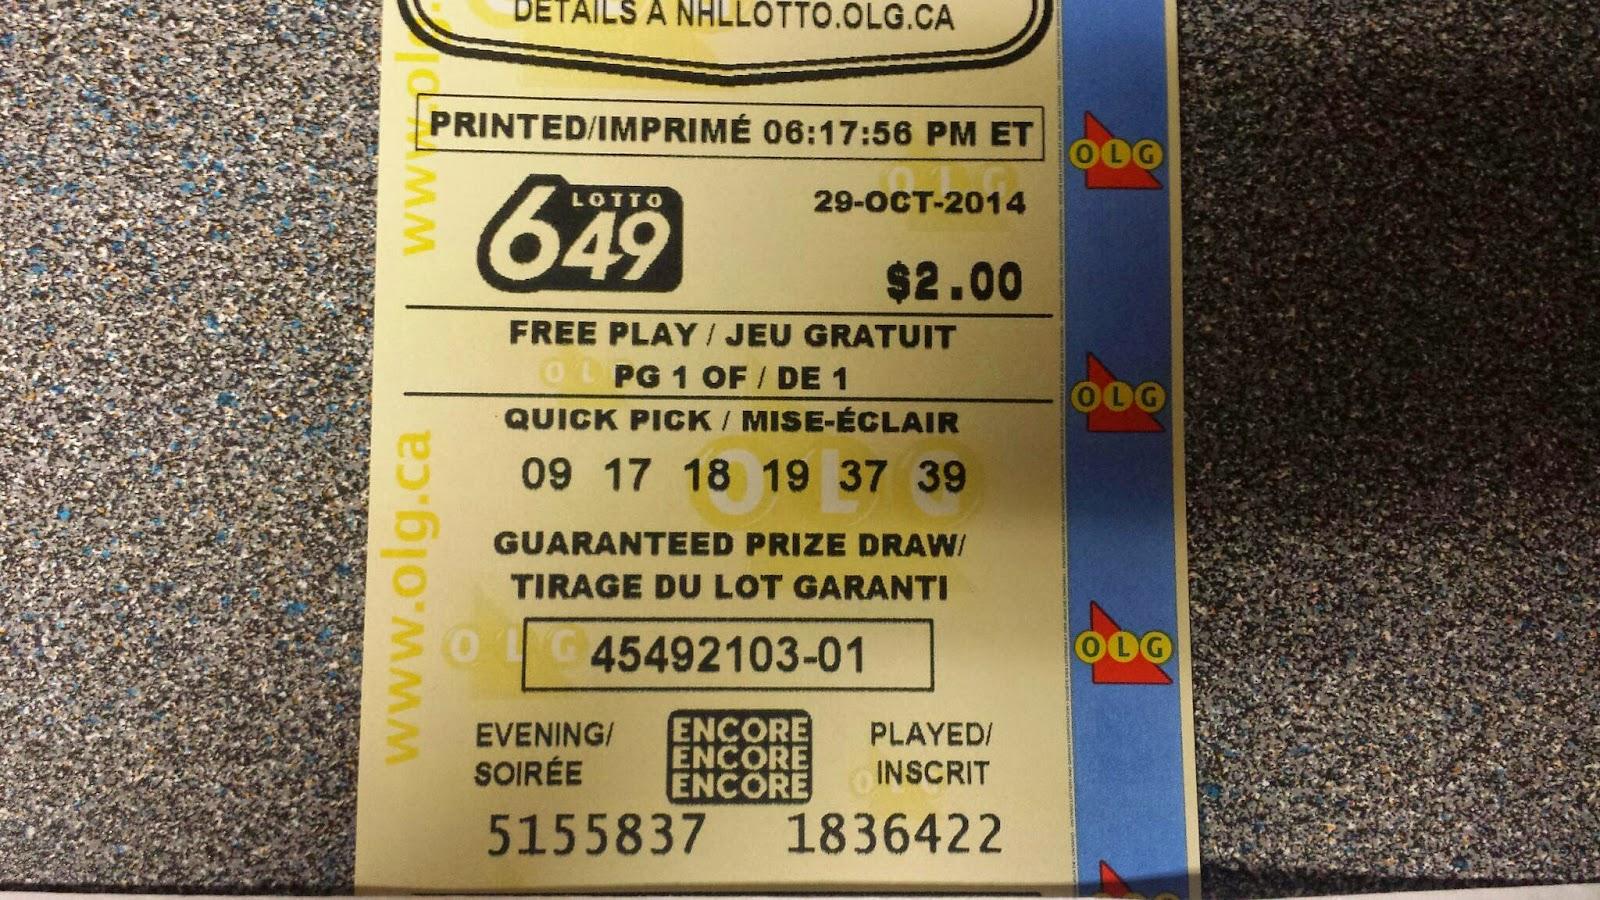 lottoa 649 guaranteed prize draw how to tell winner